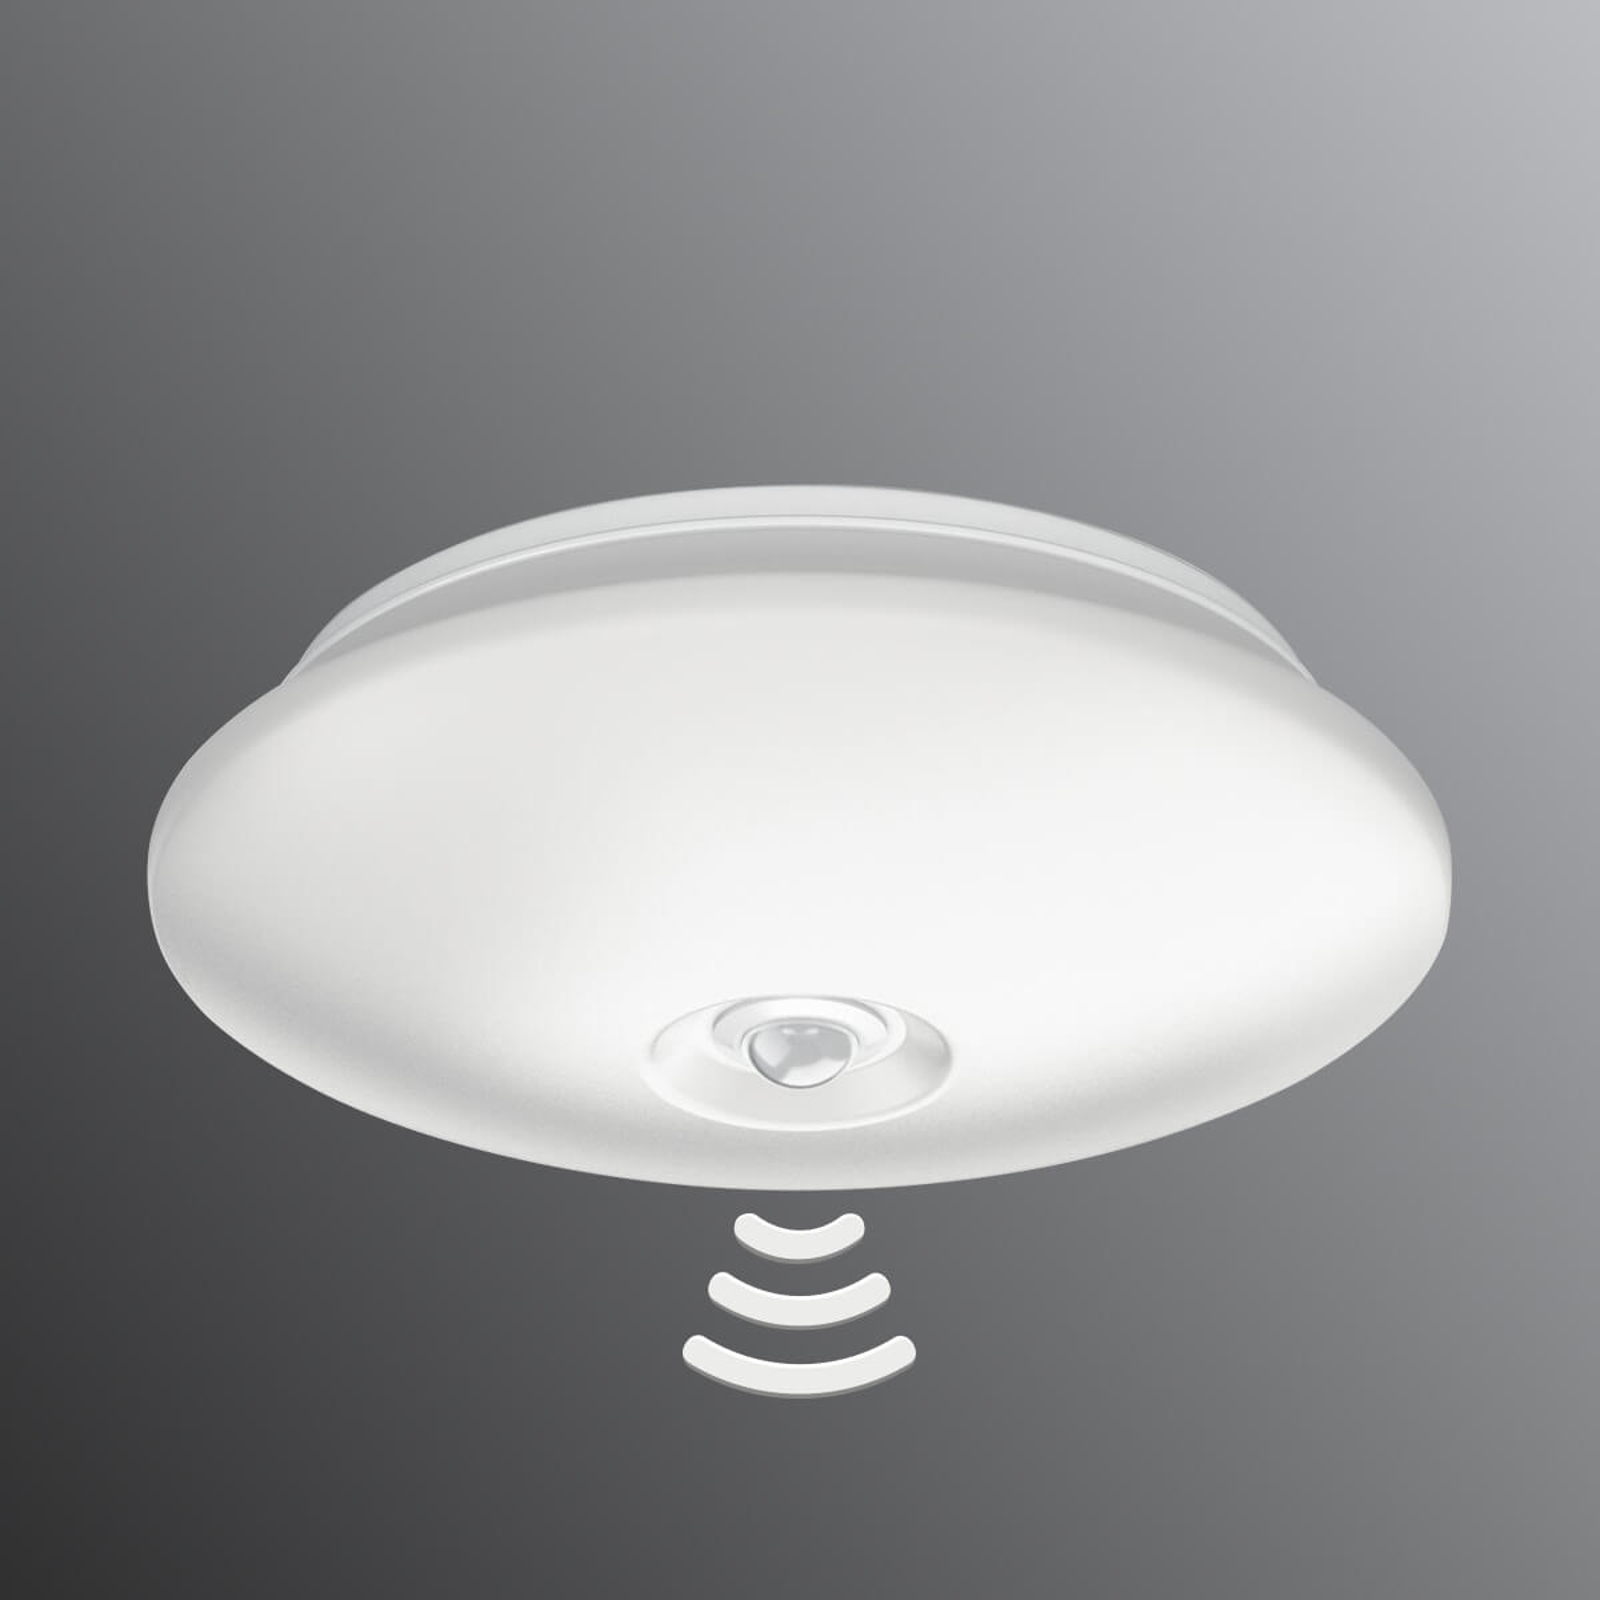 Philips Mauve lampa sufitowa LED czujnik IR 25,4cm